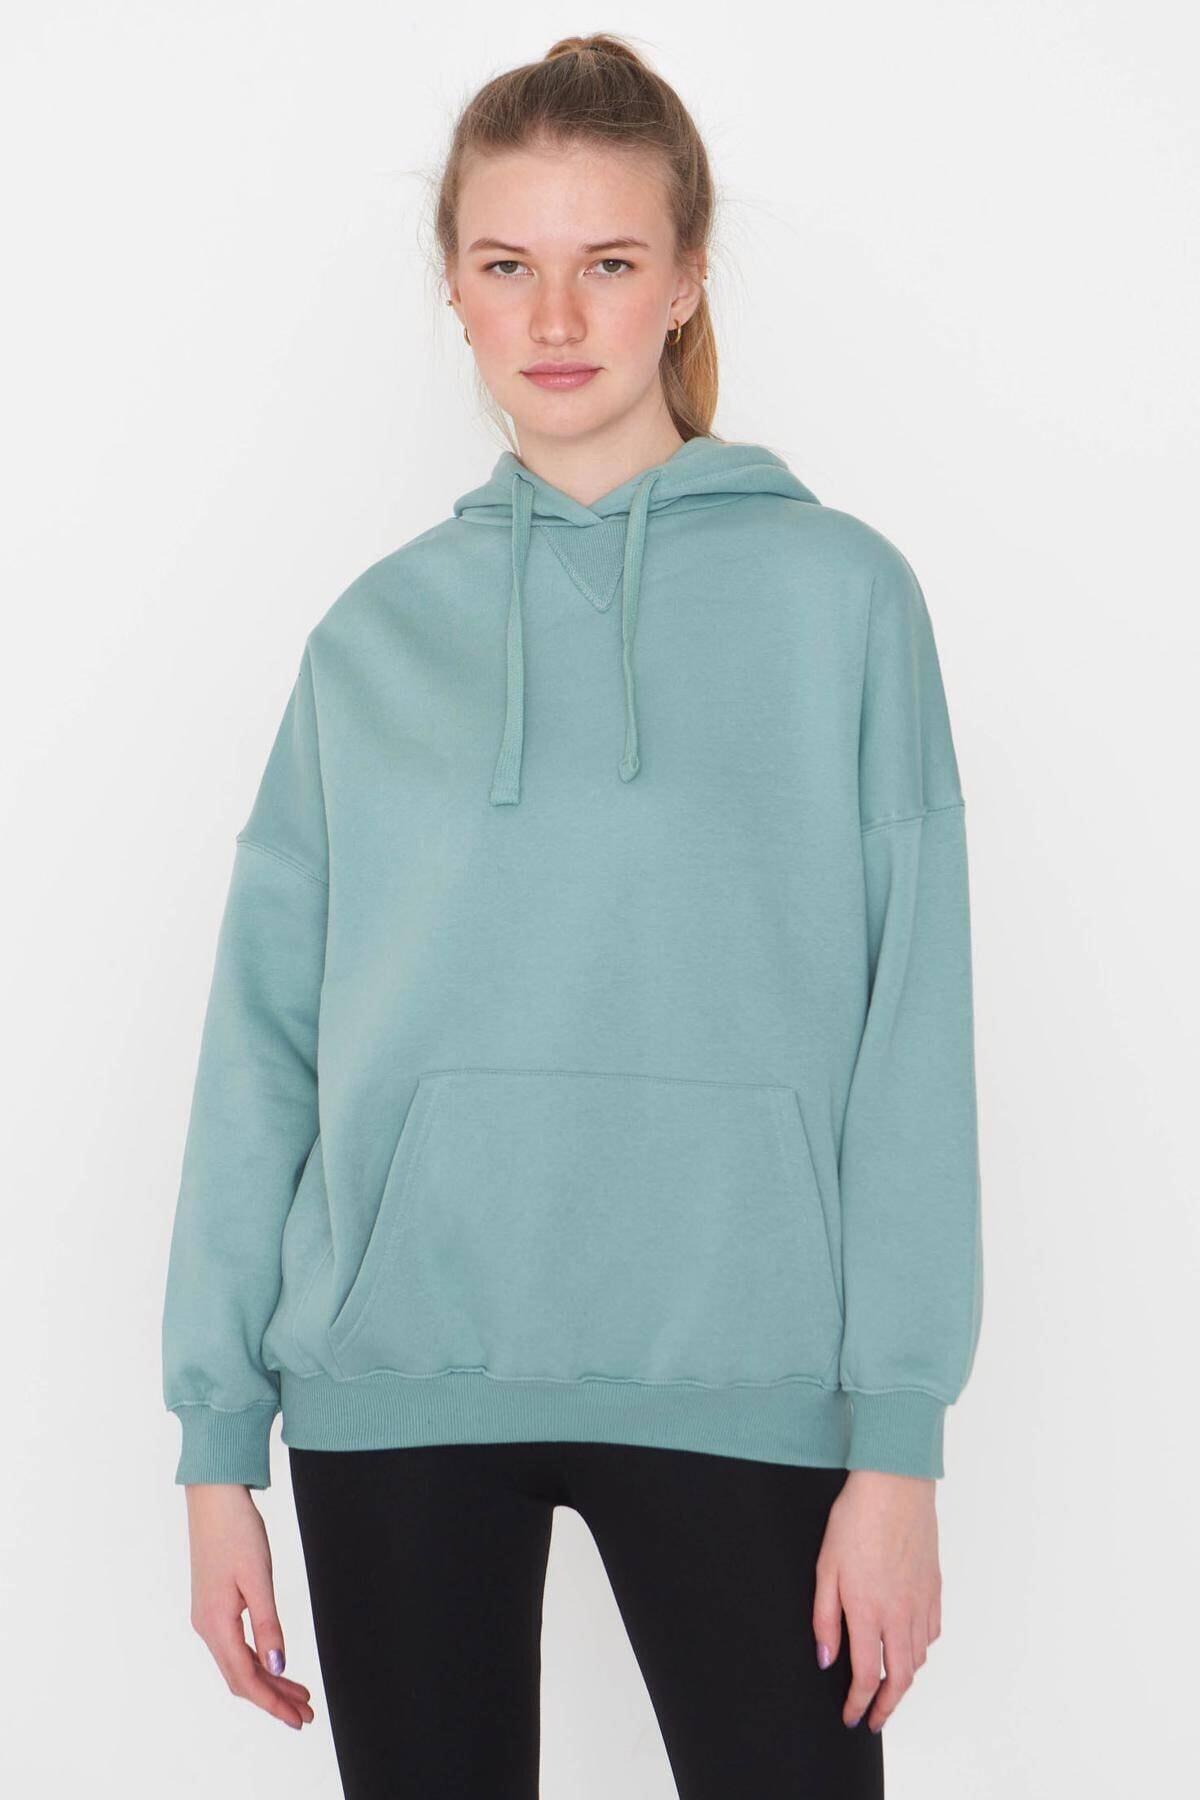 Addax Kadın Mint Kapüşonlu Sweatshirt S0519 - P10V1 Adx-0000014040 2